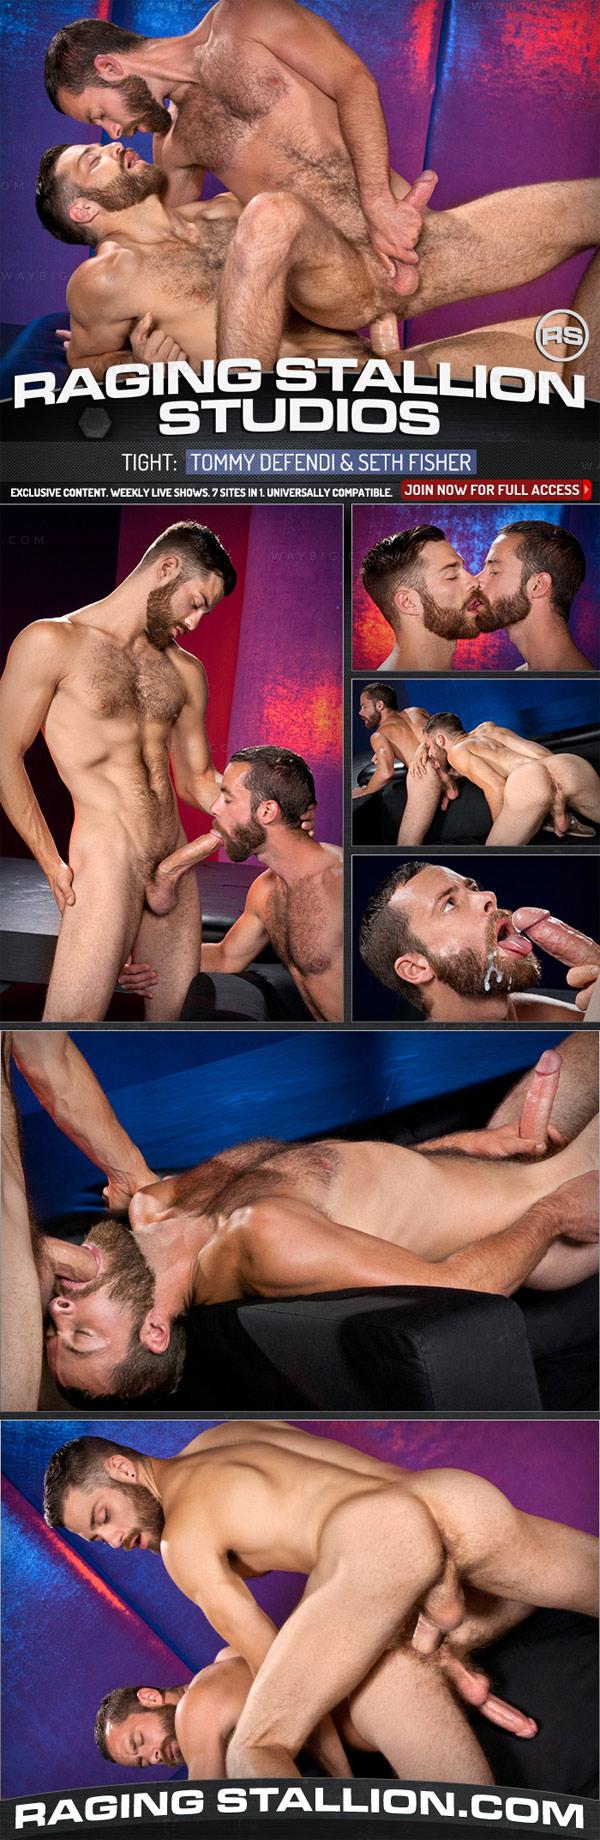 Tight (Tommy Defendi & Seth Fisher) (Scene 3) at Raging Stallion